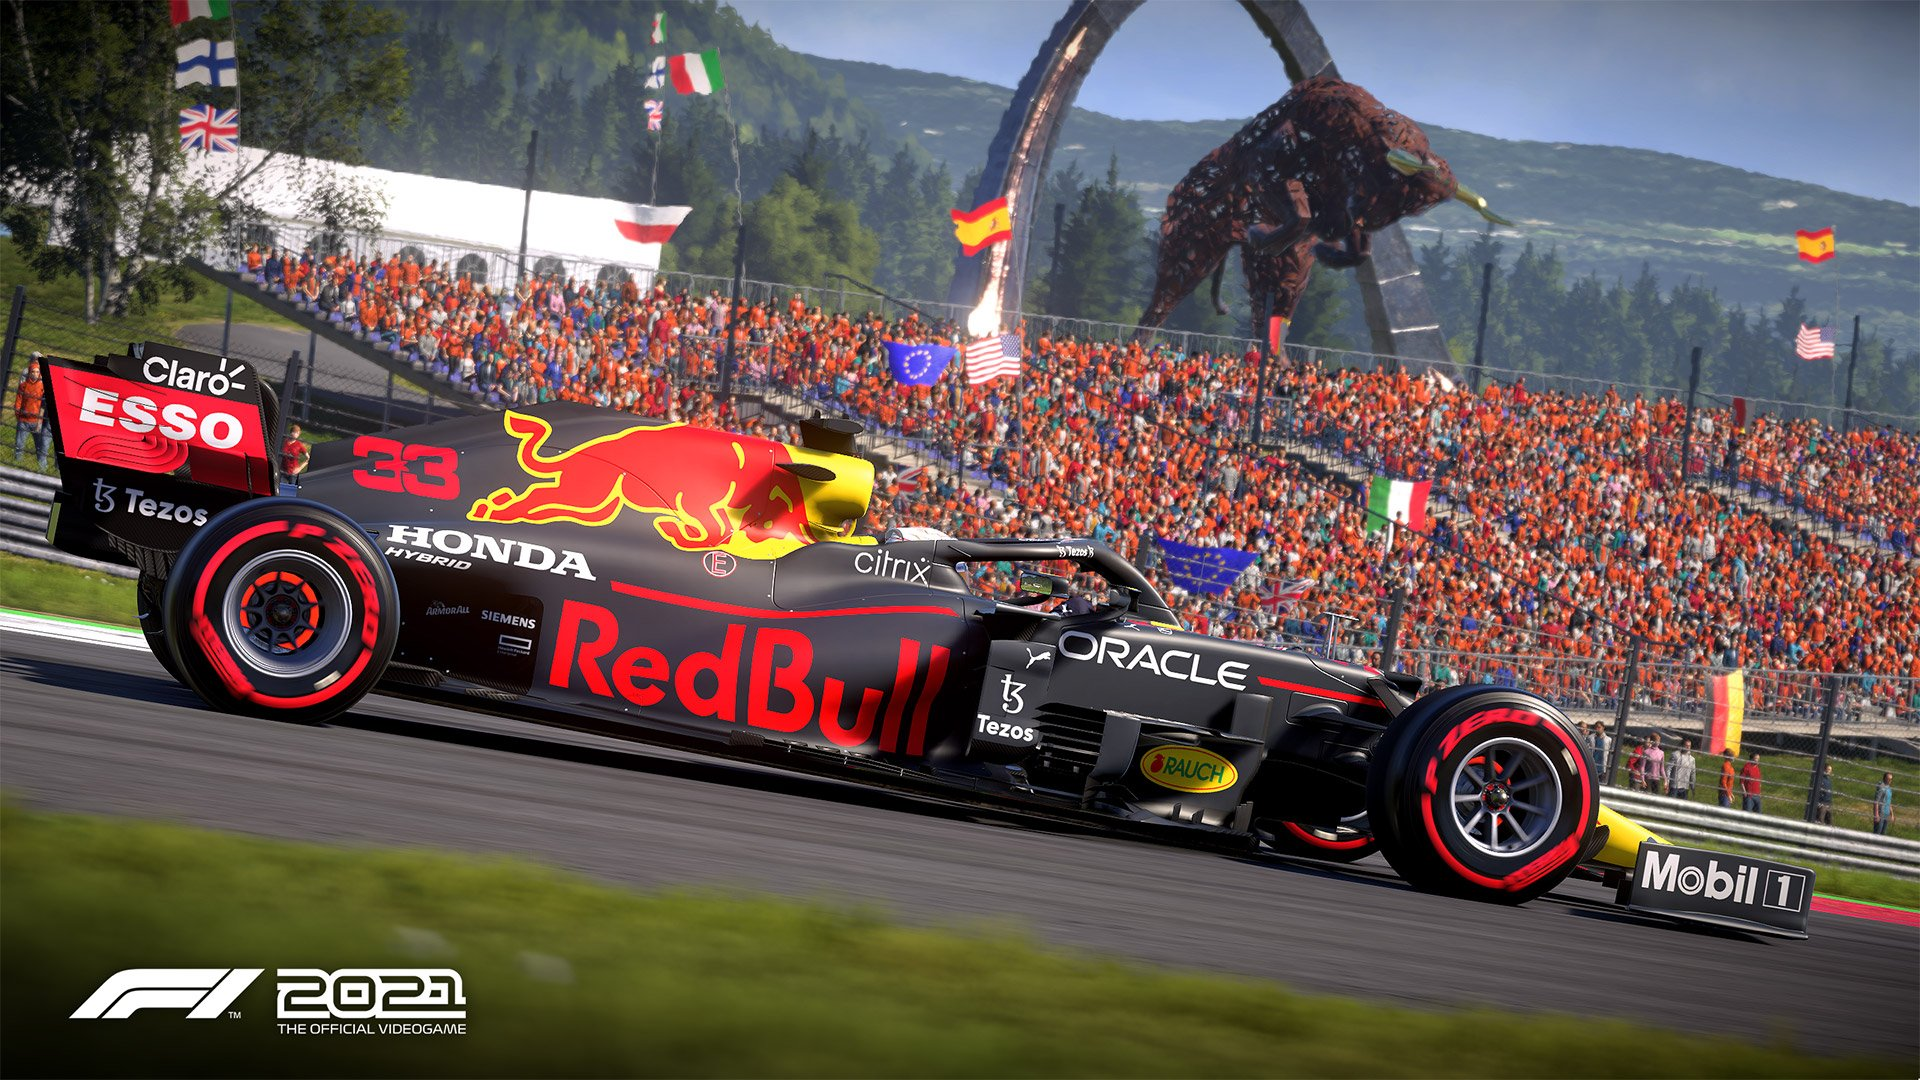 F1 2021 Red Bull